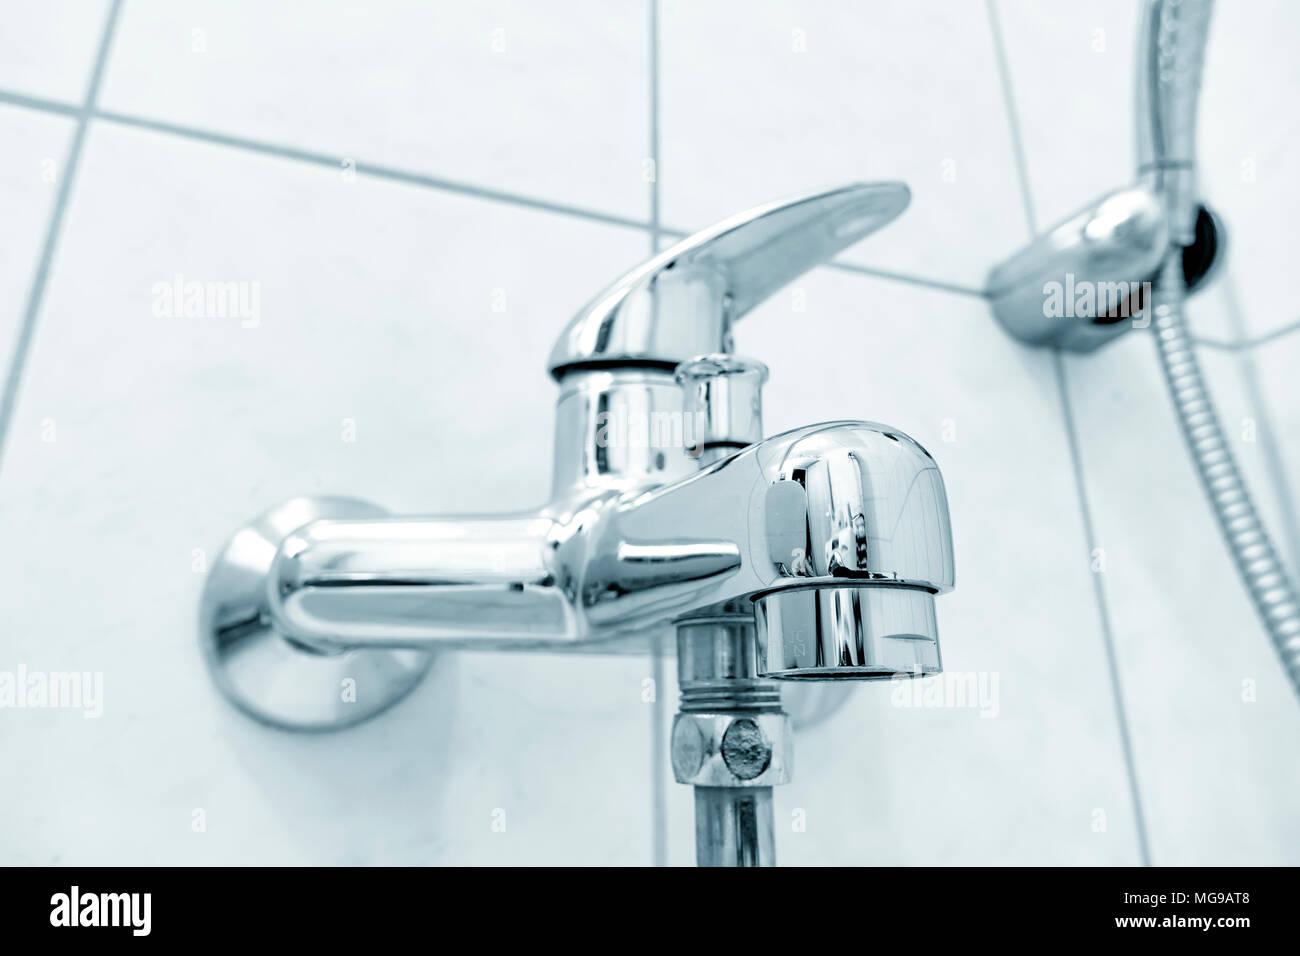 Miscelatore Vasca Da Bagno : Vasca da bagno doccia rubinetto miscelatore foto immagine stock